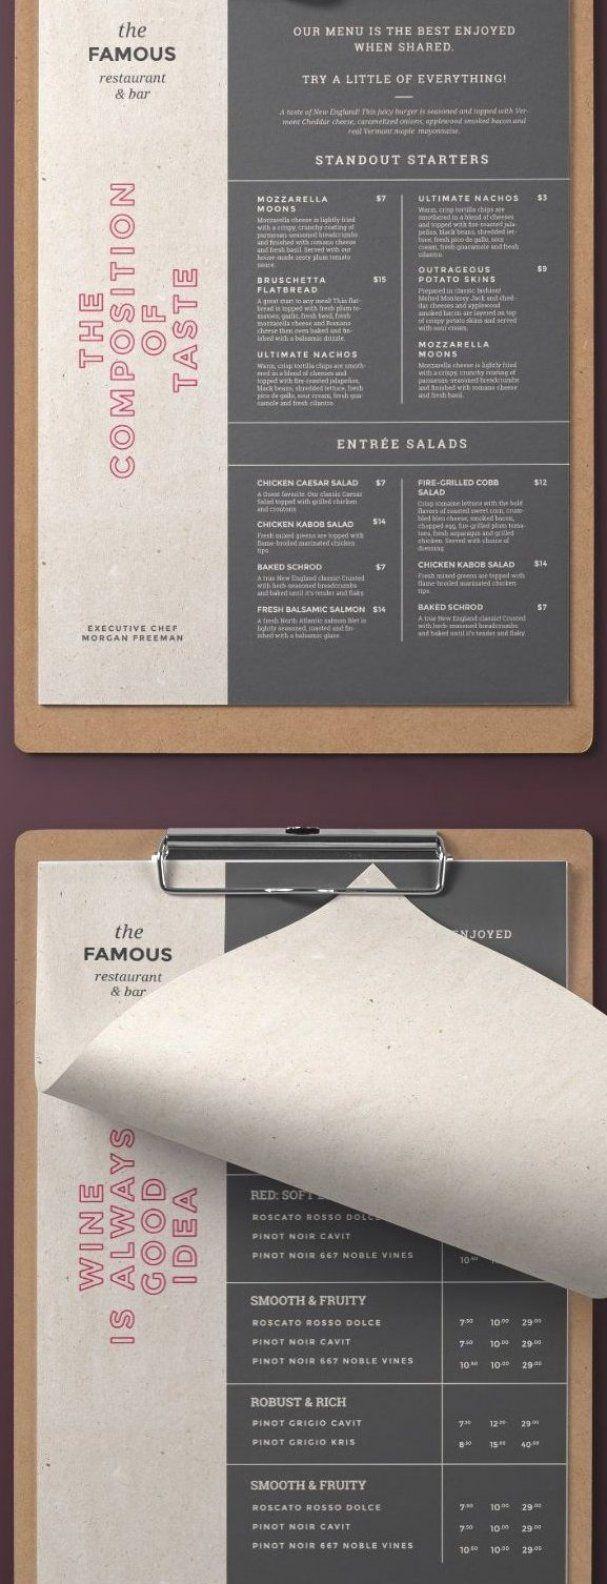 Elegant and simple restaurant menu  Trendy and easy editable menu design for your restaurant  cafe  bistro  tavern  bar or club  #restaurant #menu #design #cafe #food #drinks #template #psd #minimal #simple #elegant